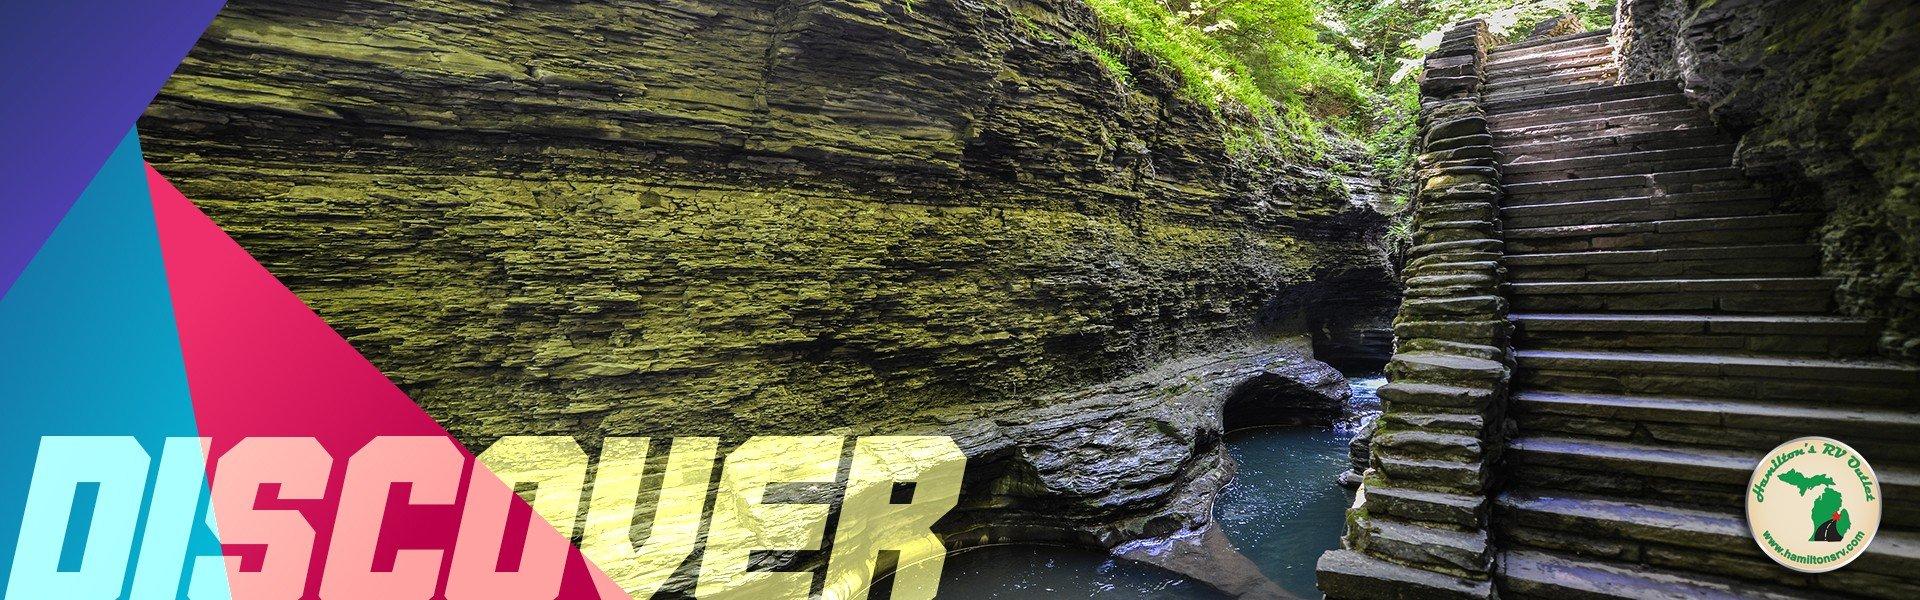 Discover Watkins Glen State Park